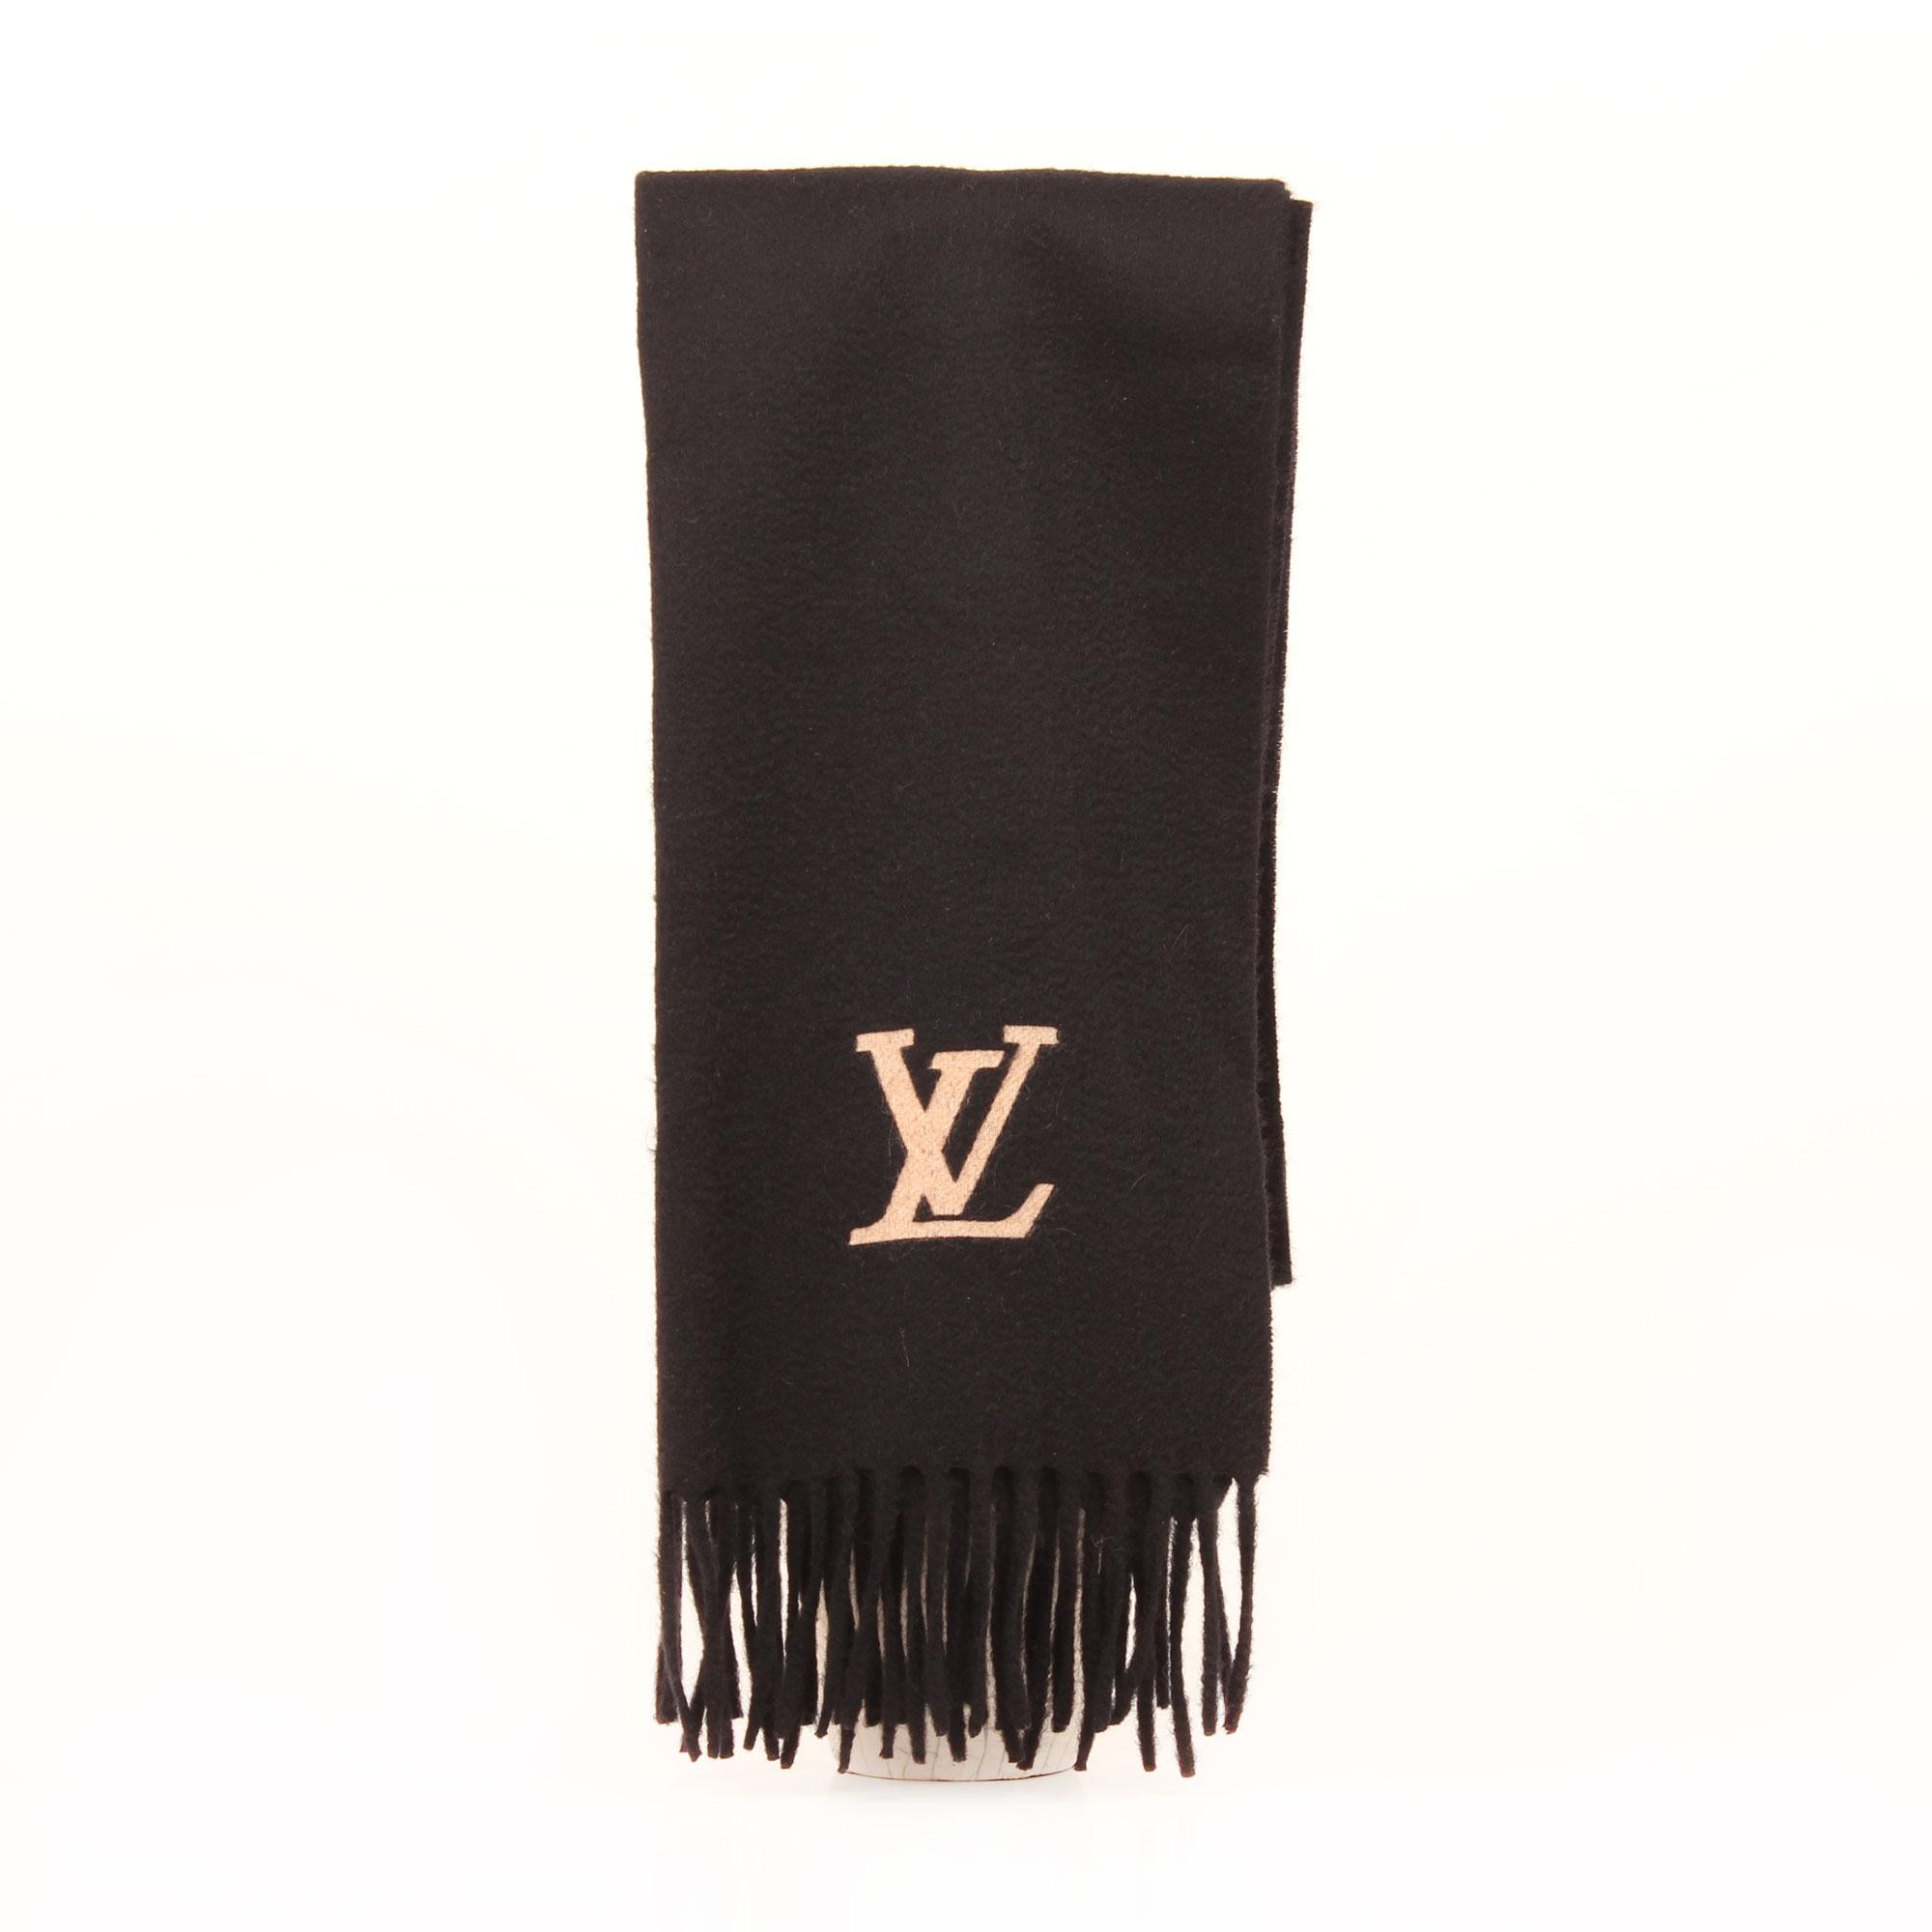 scarf-louis-vuitton-jehlam-cashmere-black-general